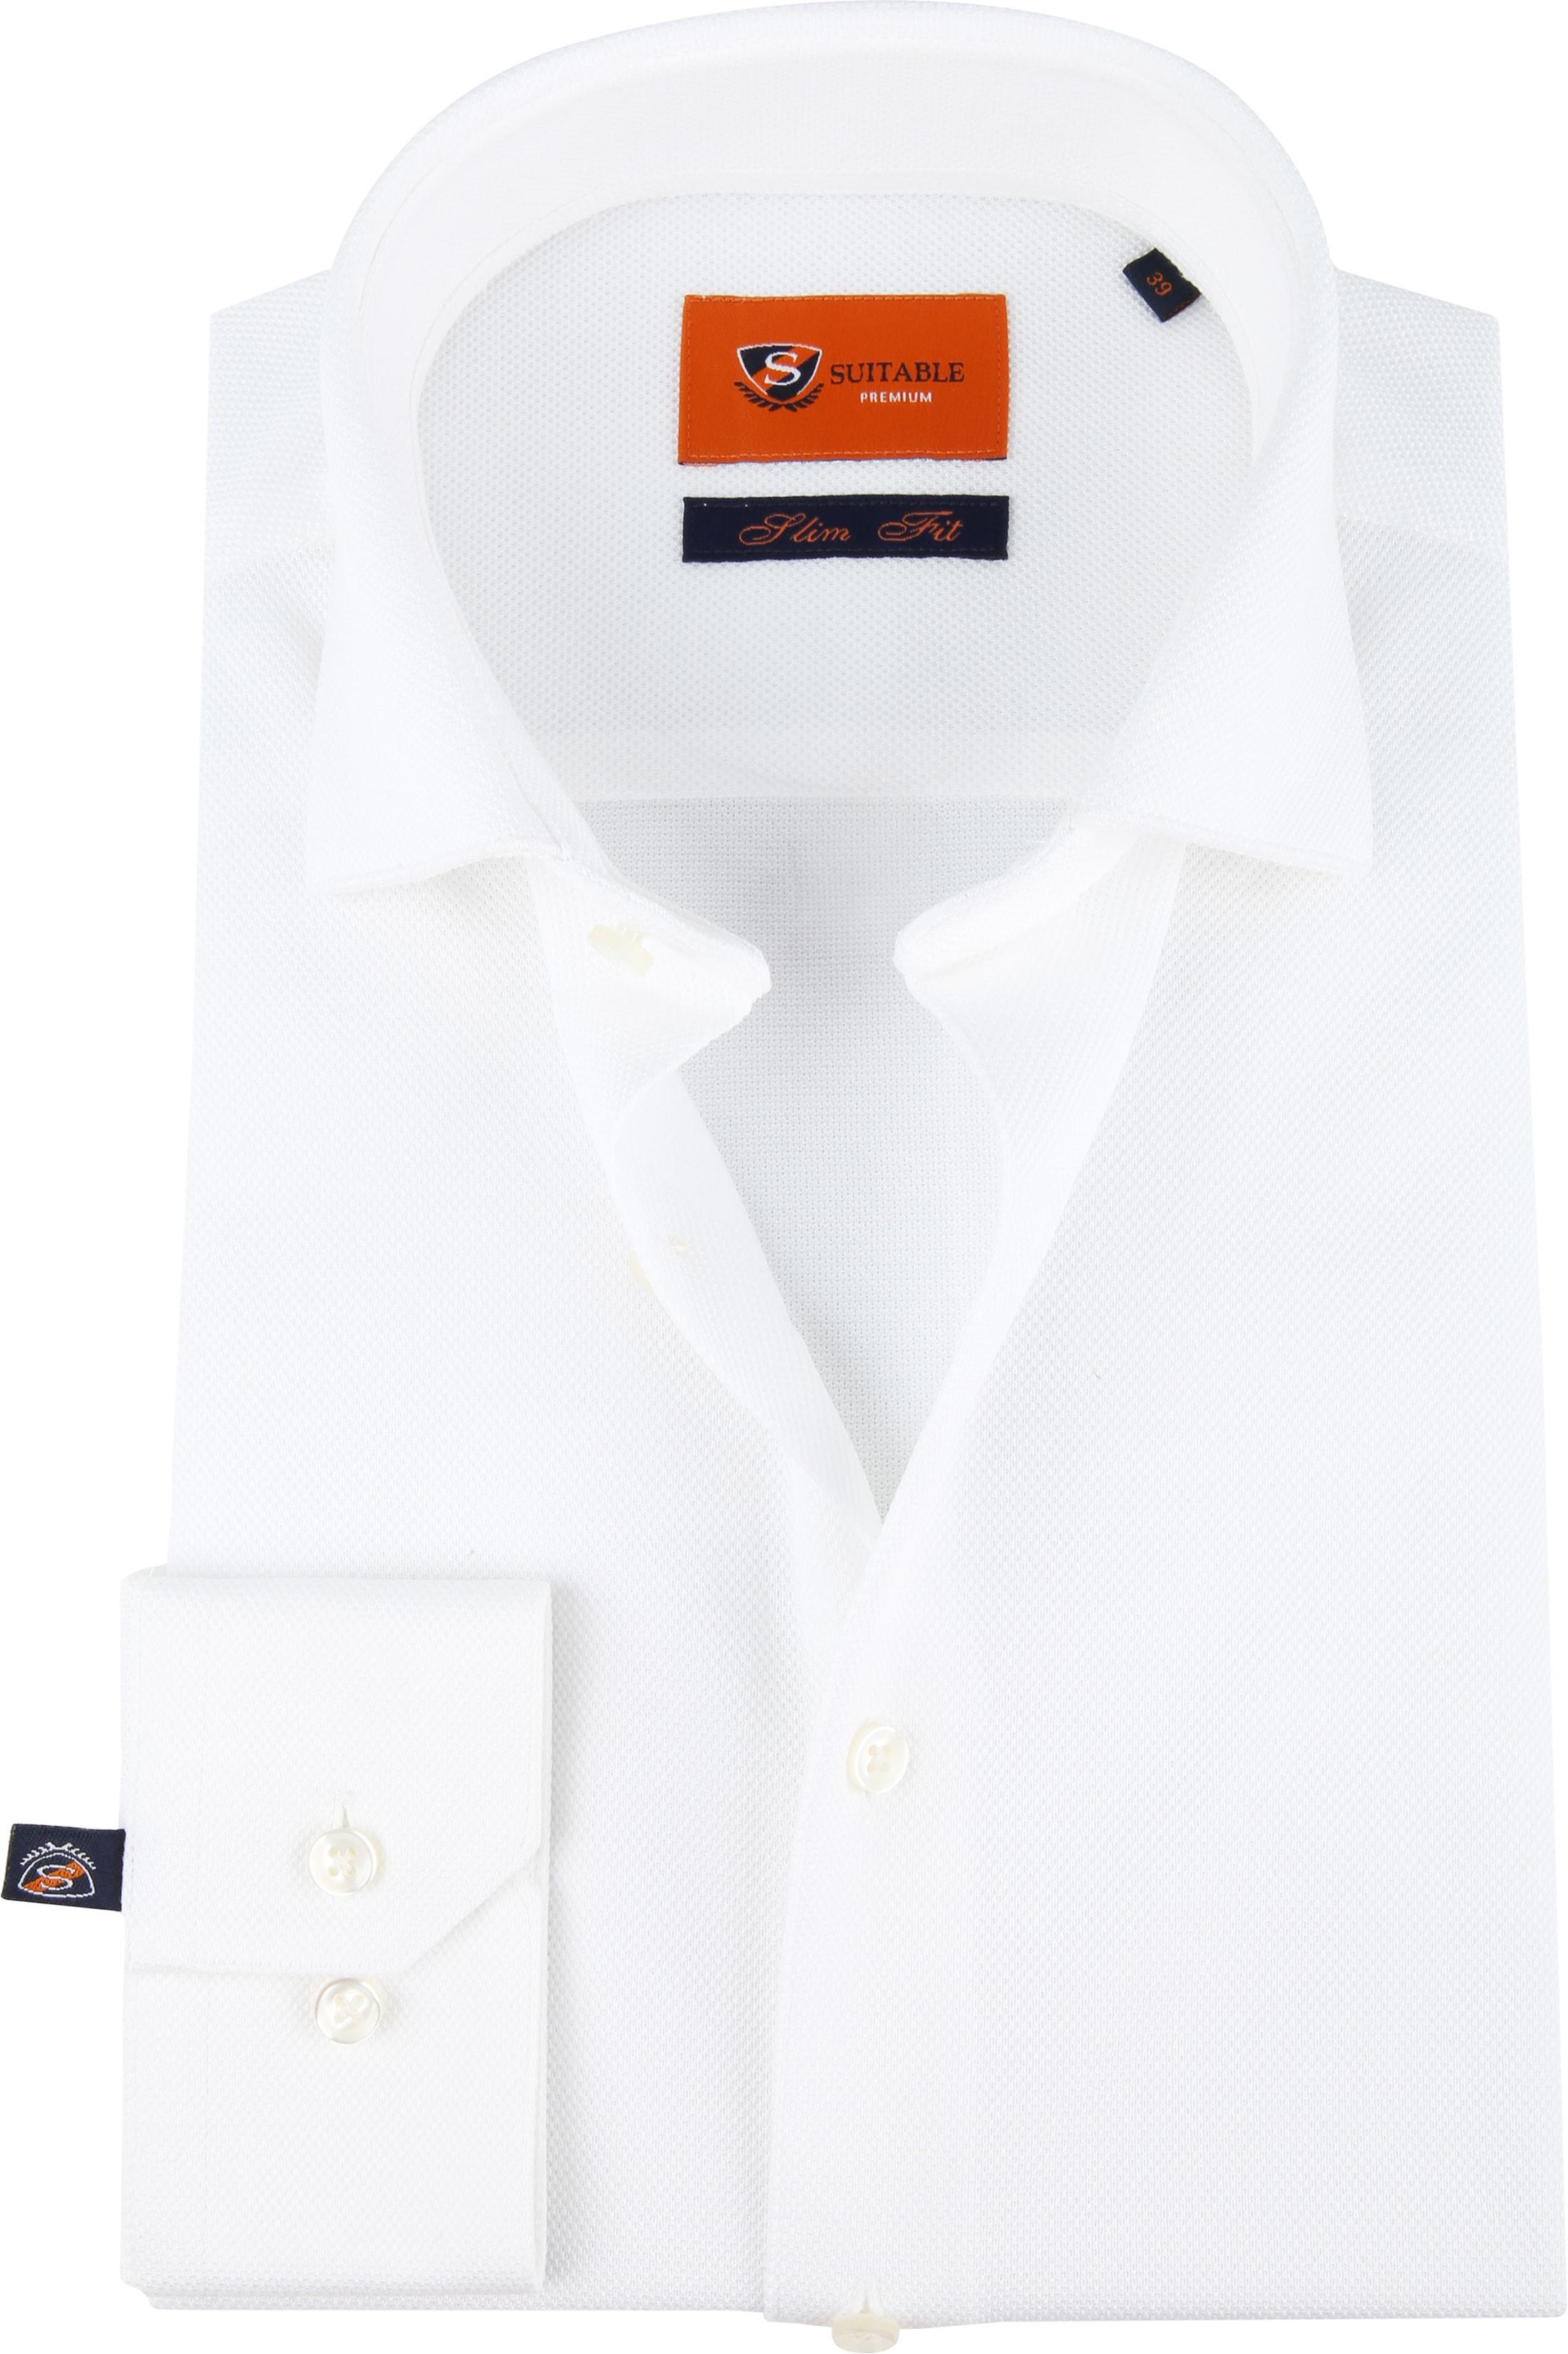 Suitable Jersey Hemd Weiß